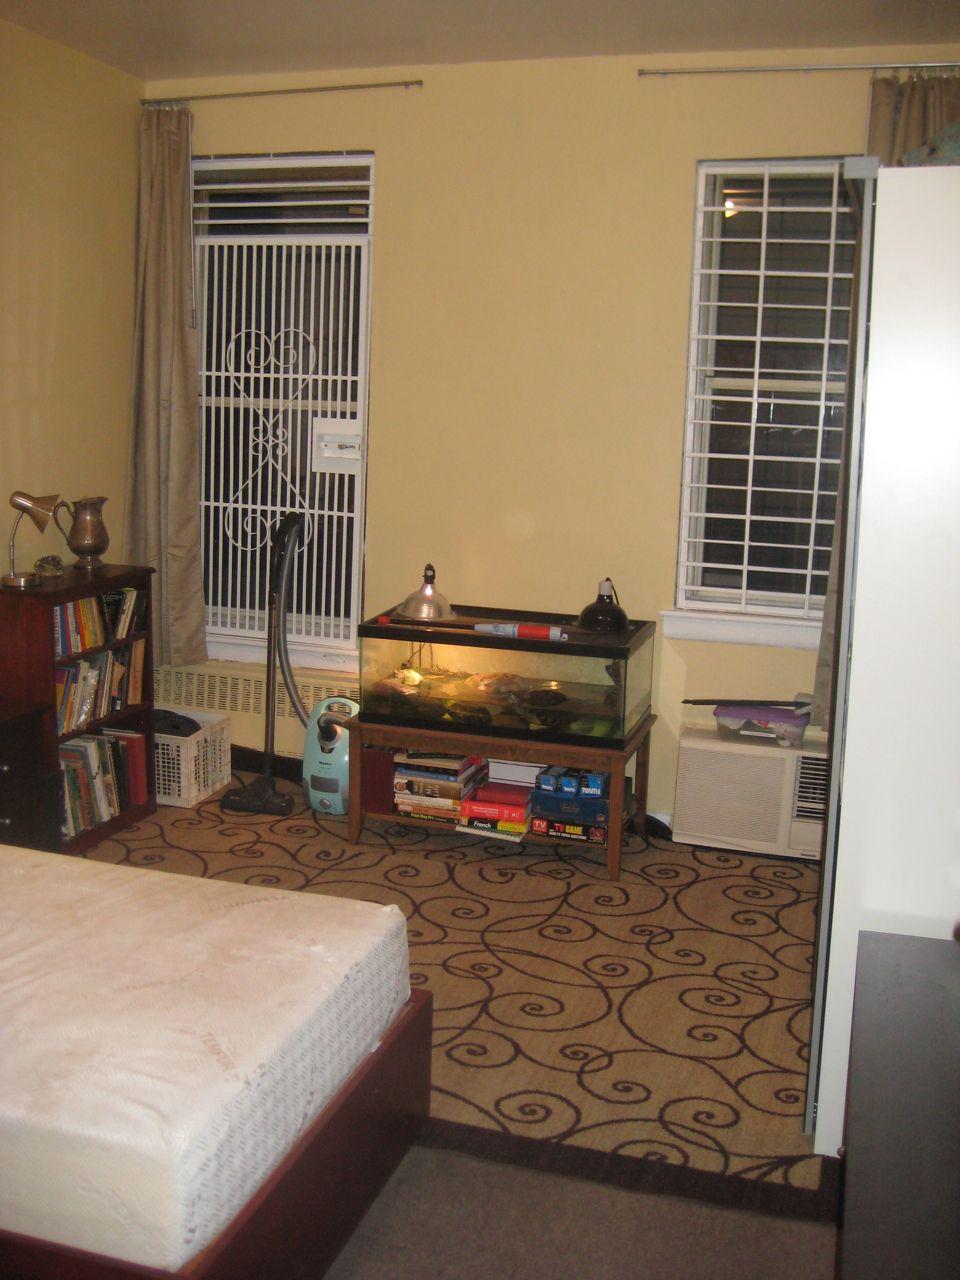 Home Organizing | Tiny apartments, Home, Home organization